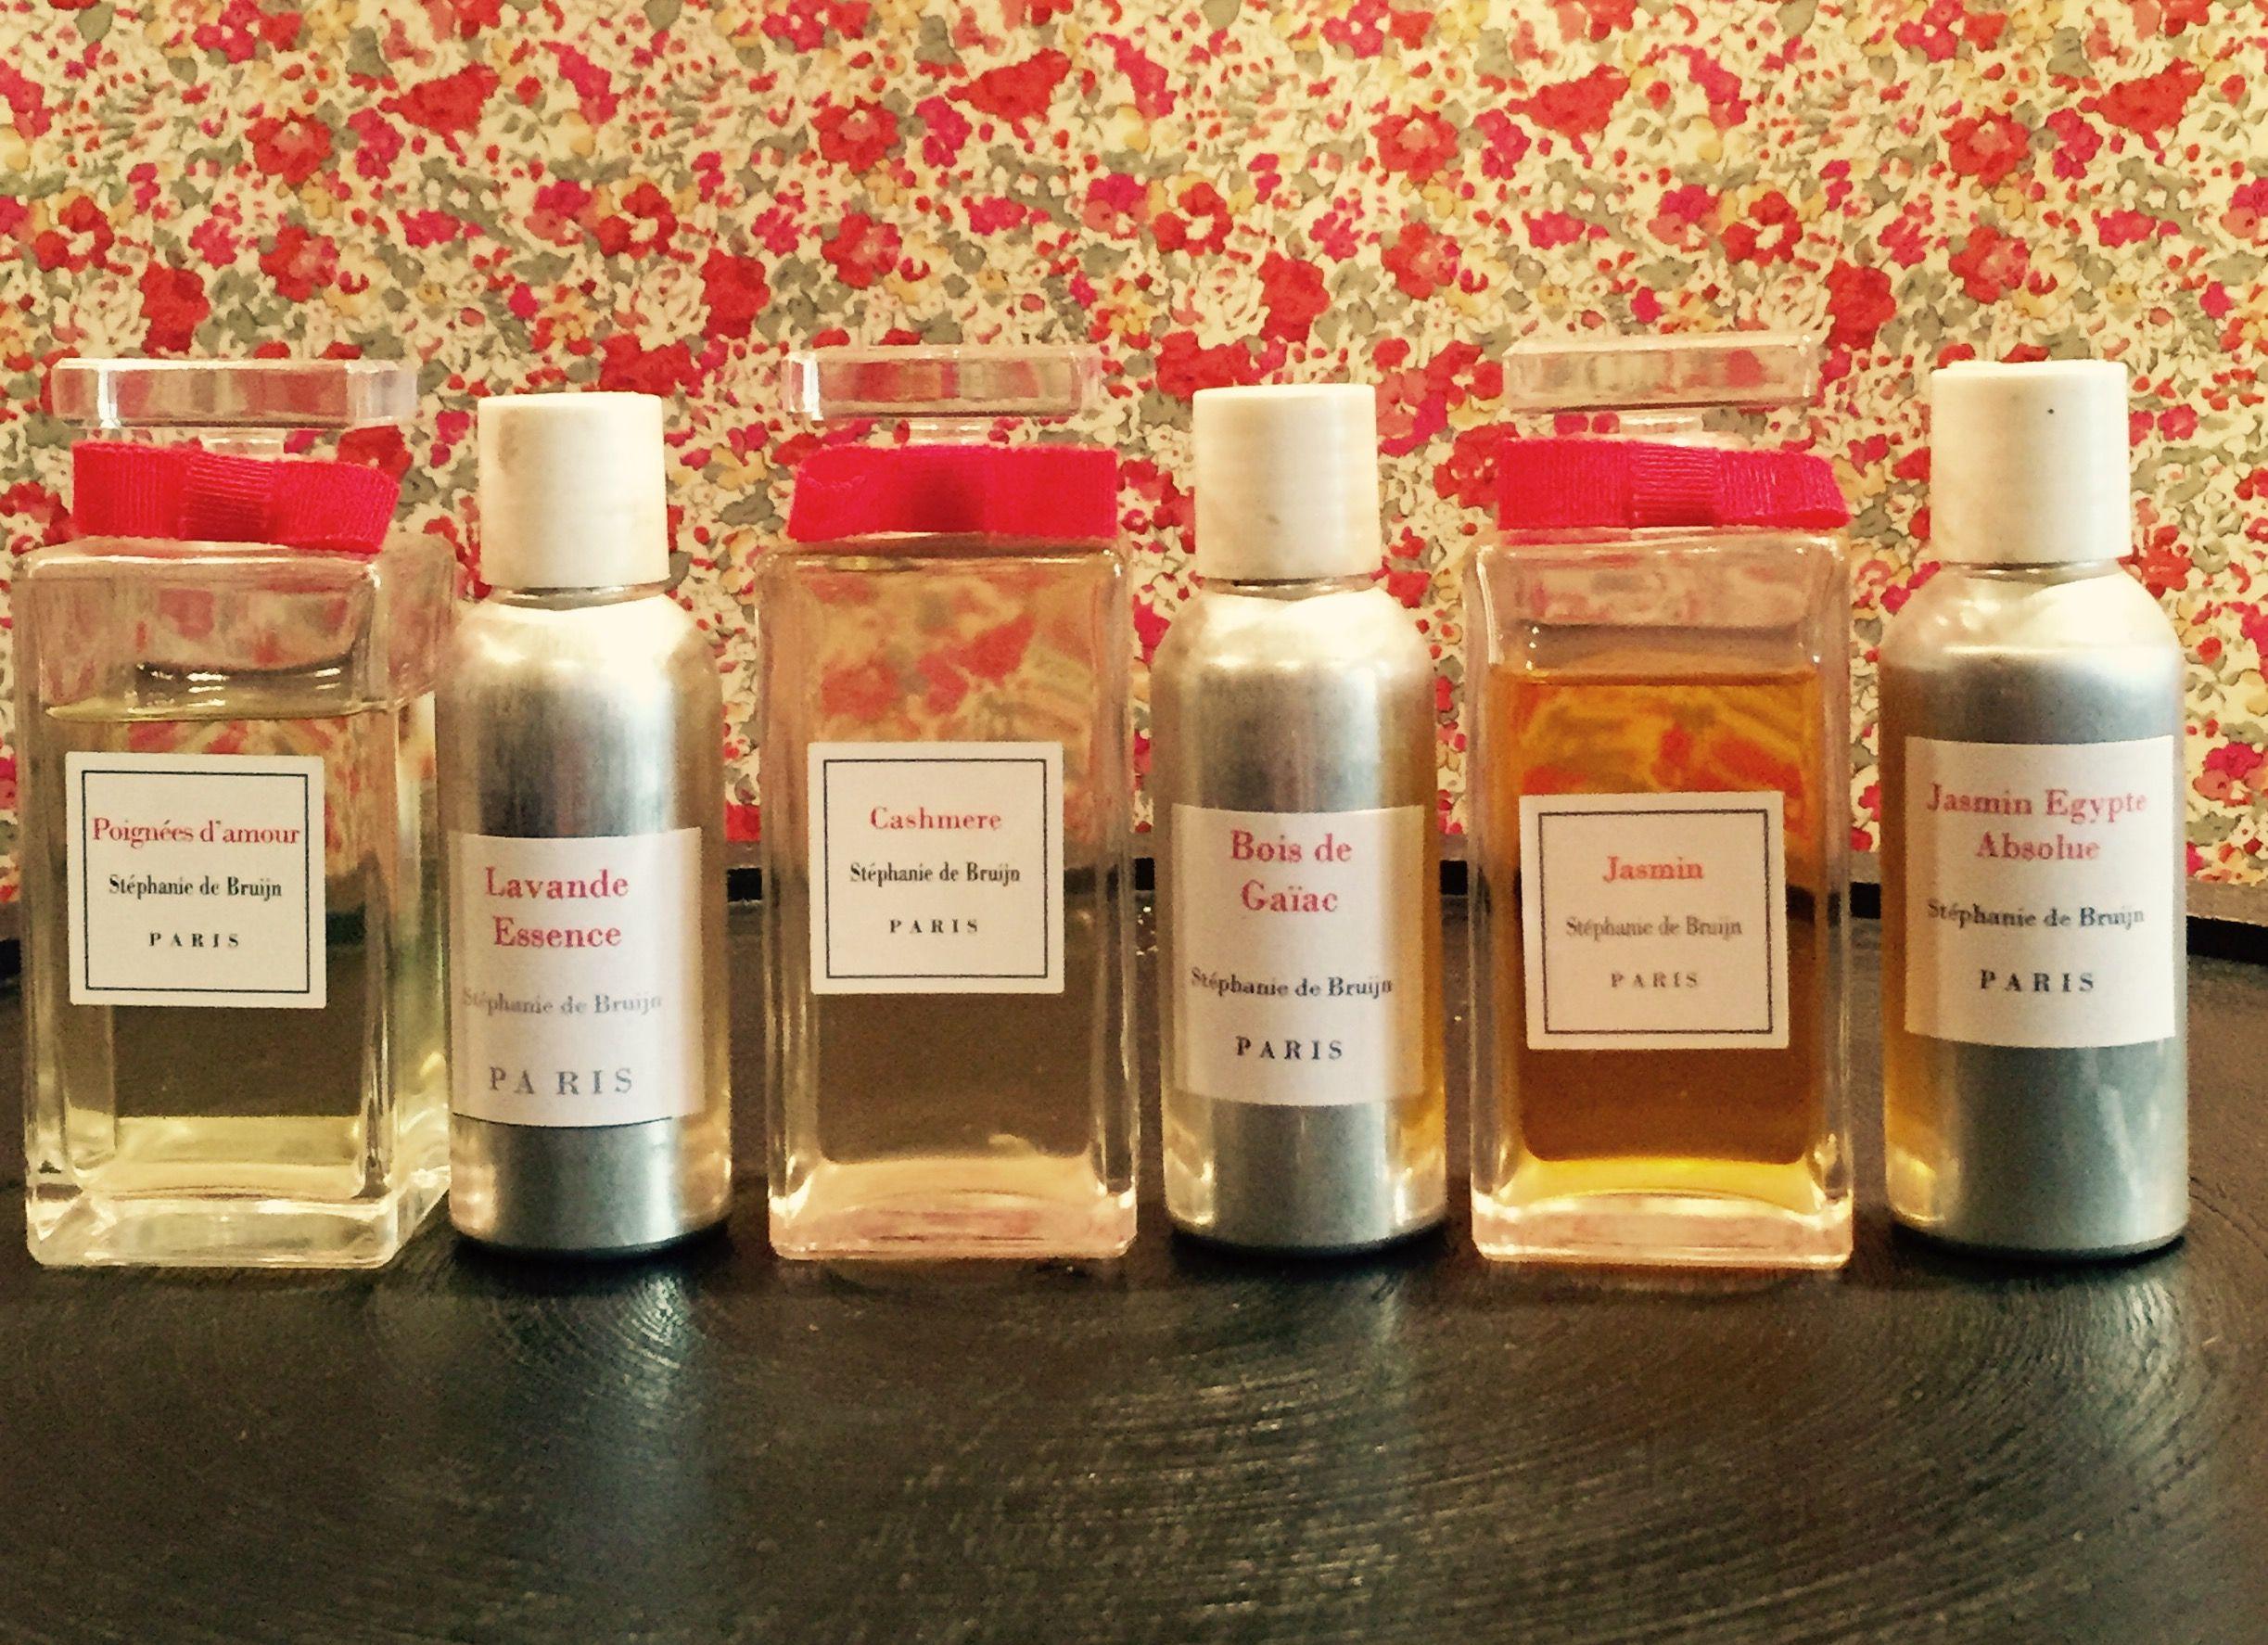 #Parfumsurmesure #Perfumes #Paris #Boudoir #RiveGauche